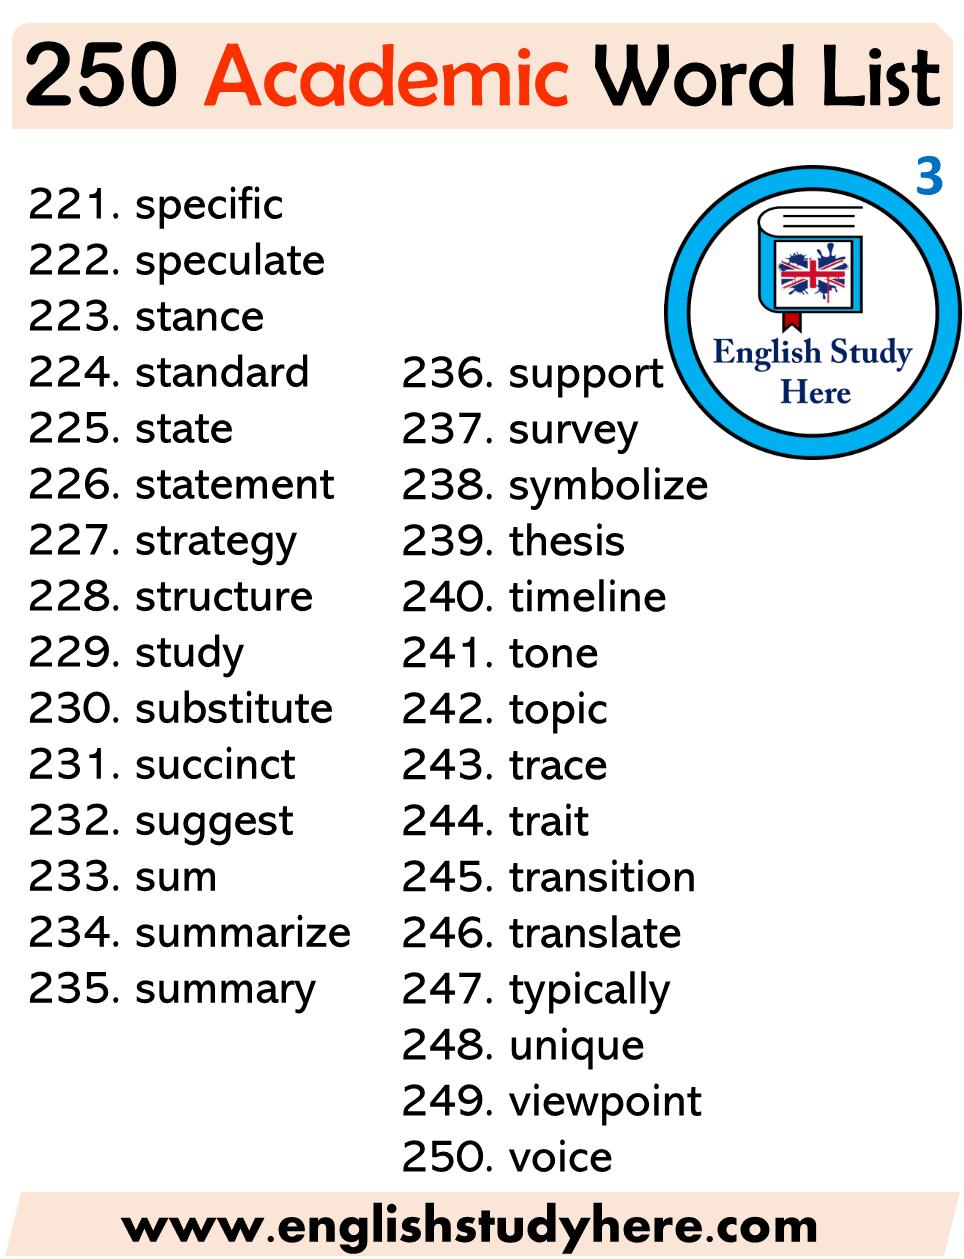 250 Academic Words List English Vocabulary Words English Study